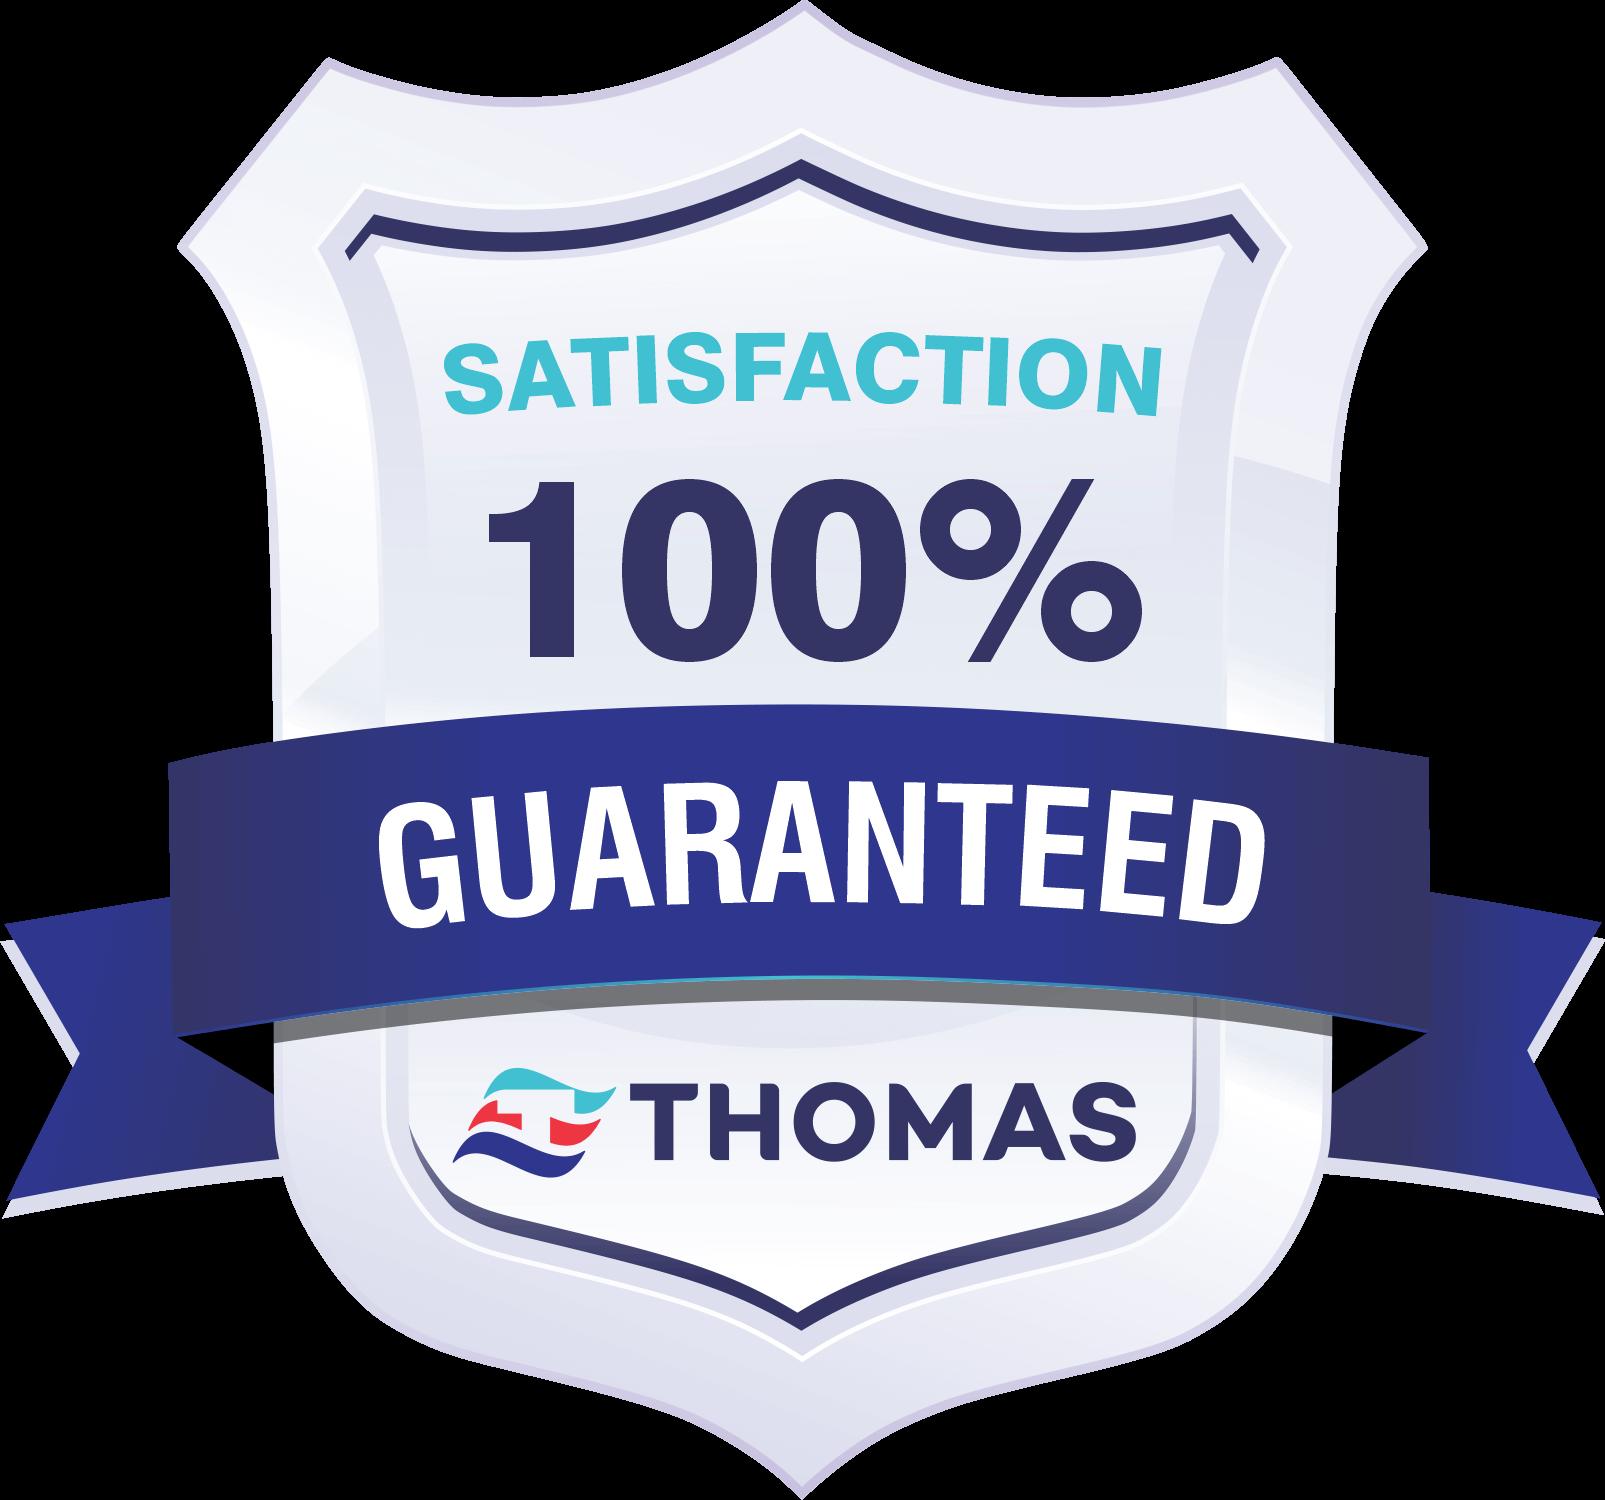 Thomas Satisfaction Guarantee